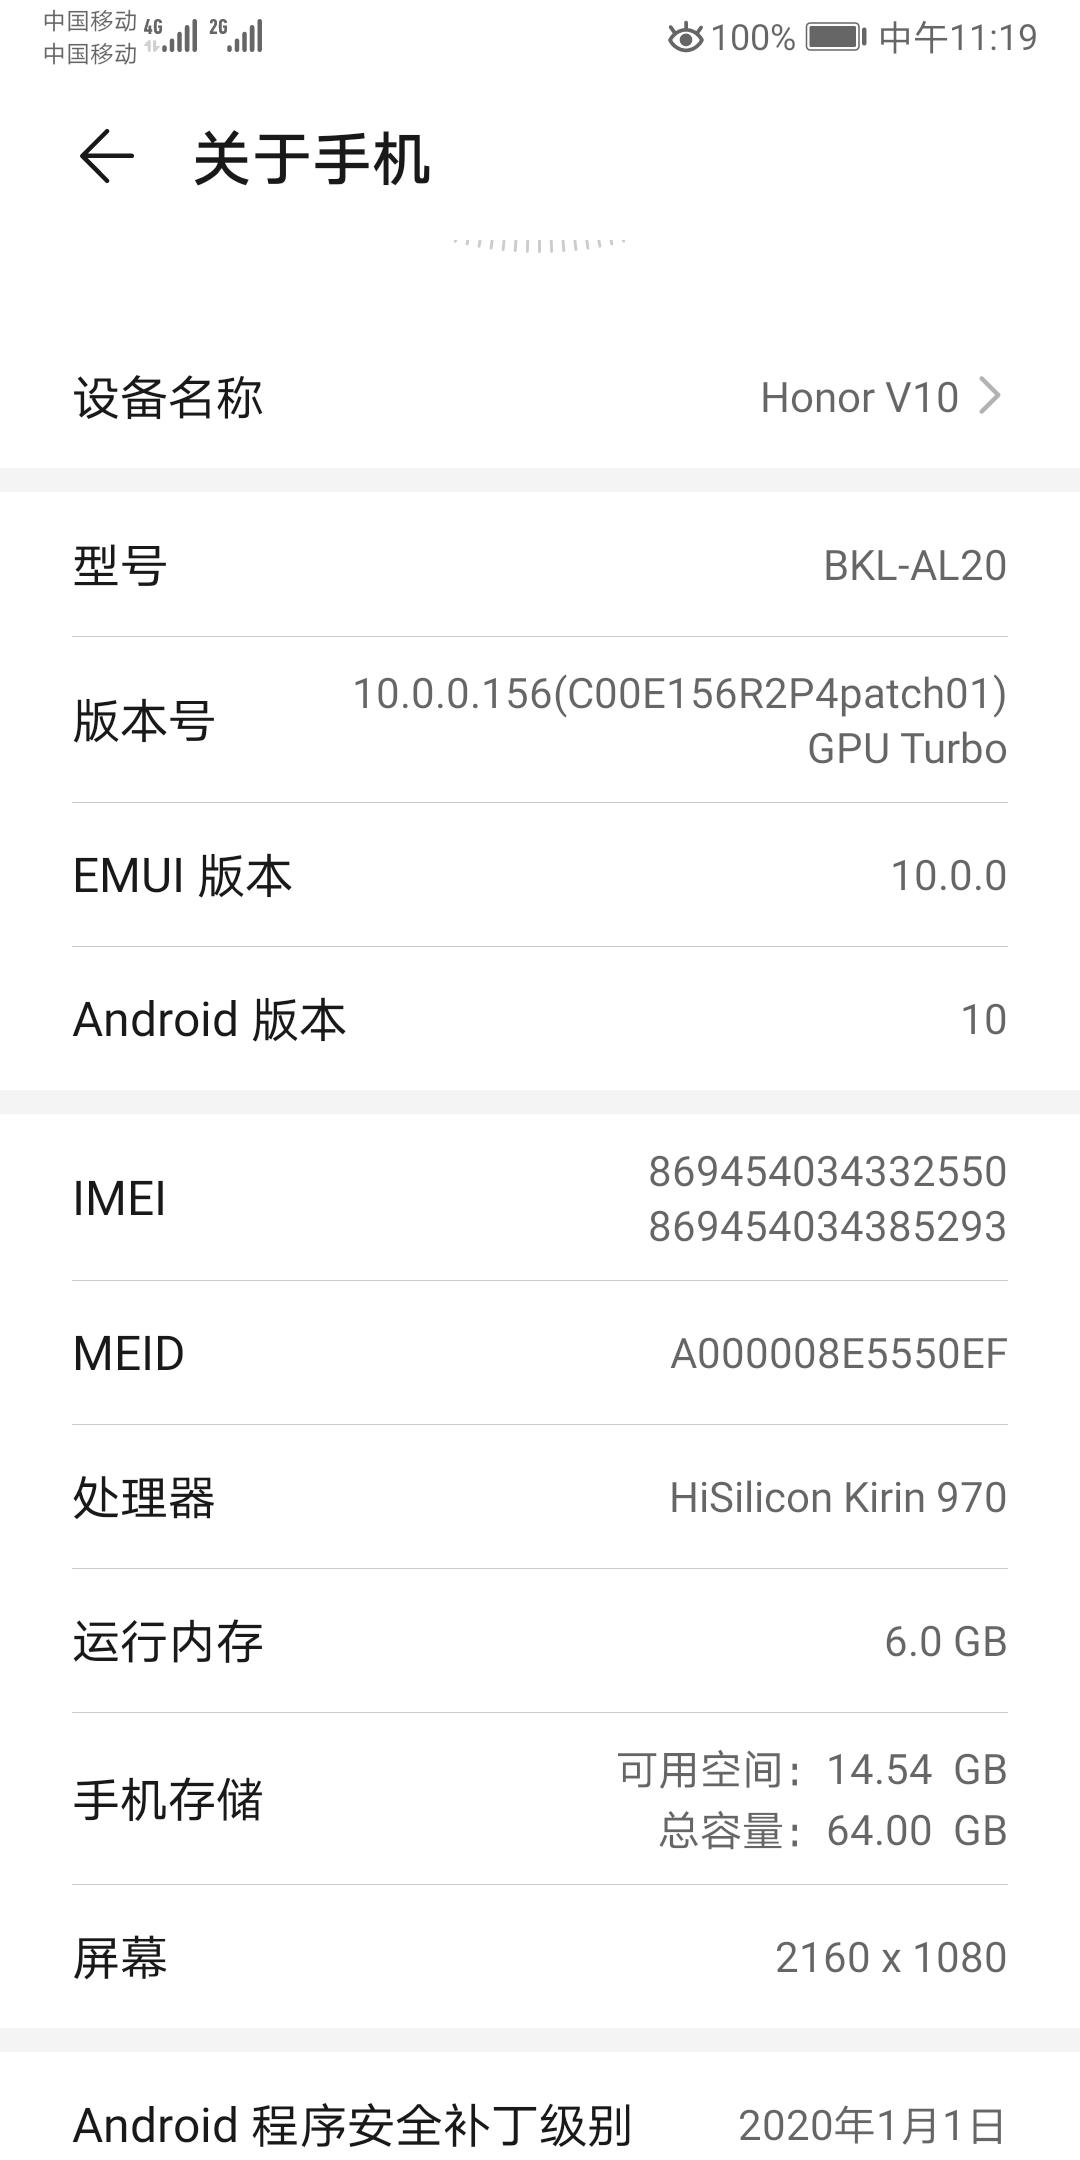 Screenshot_20200602_111941_com.android.settings.jpg